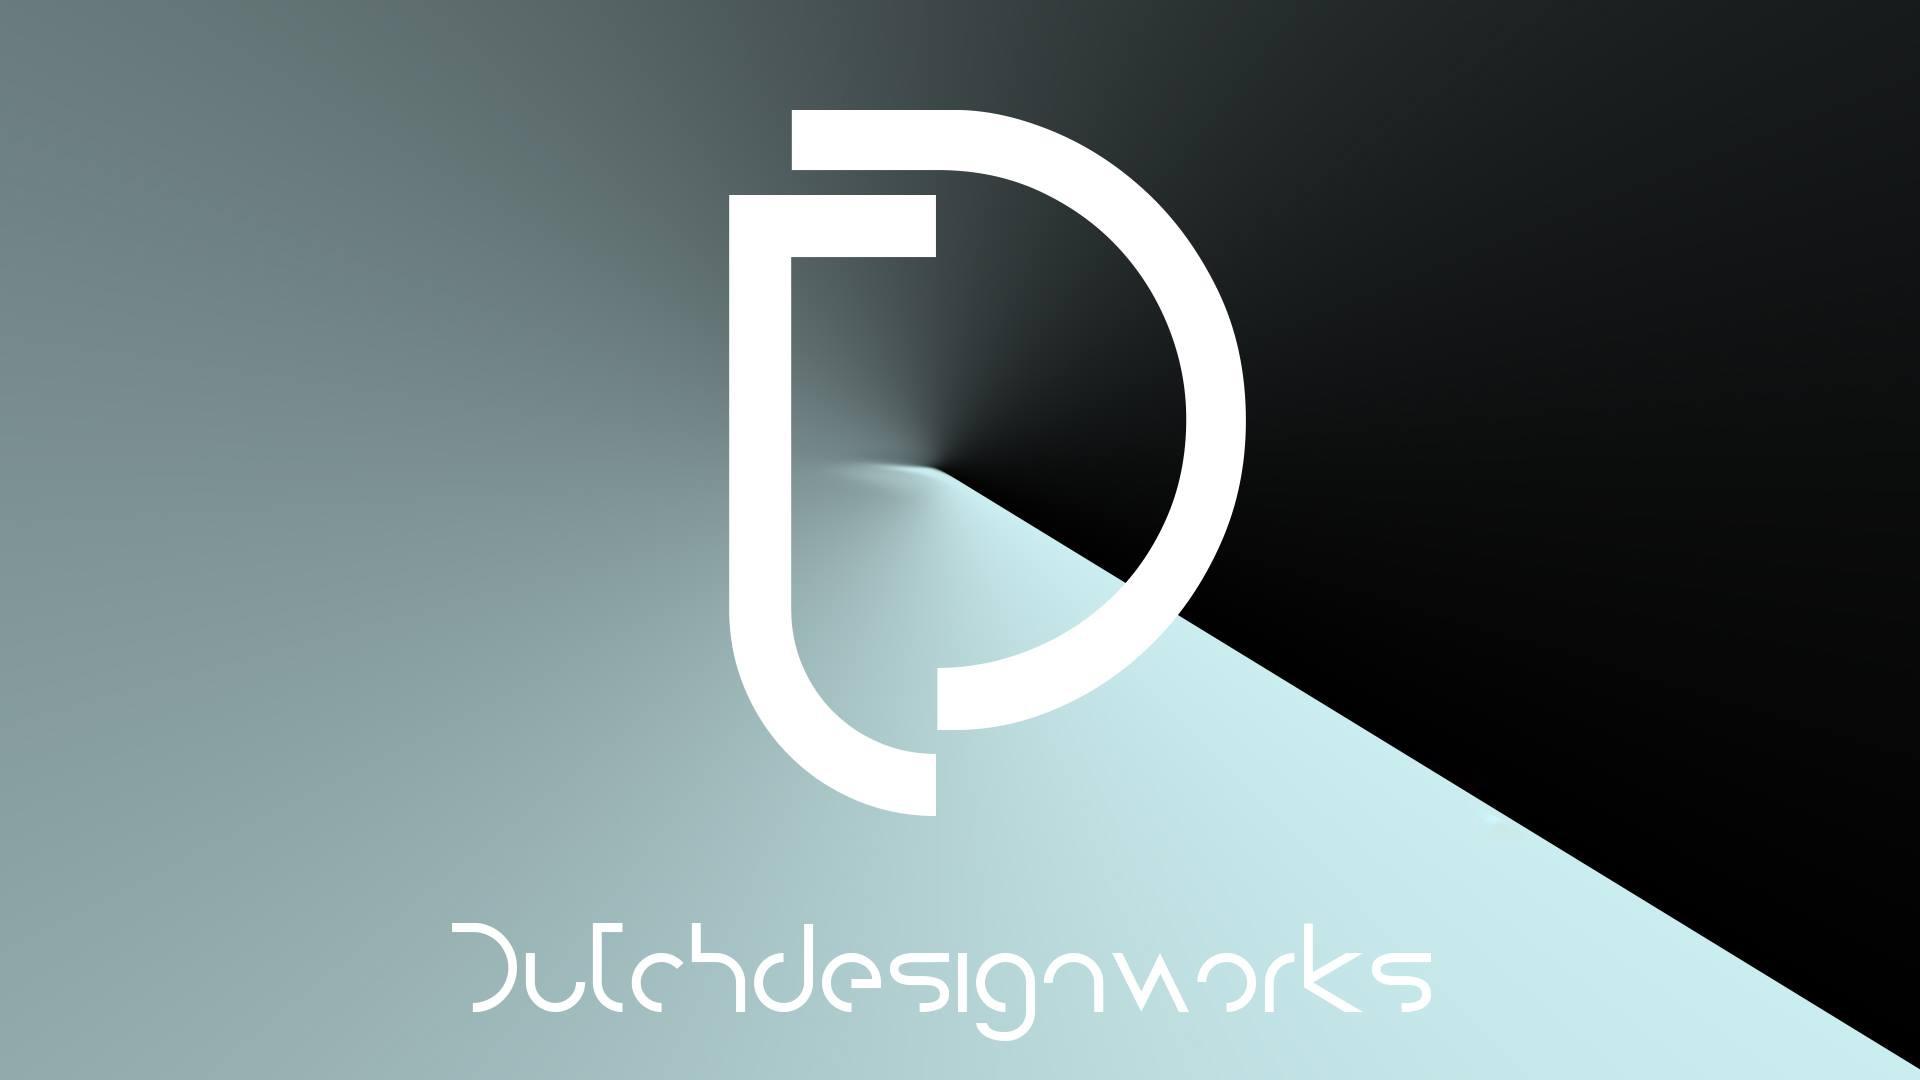 DUTCHDESIGNWORKS (@dutchdesignworks) Cover Image